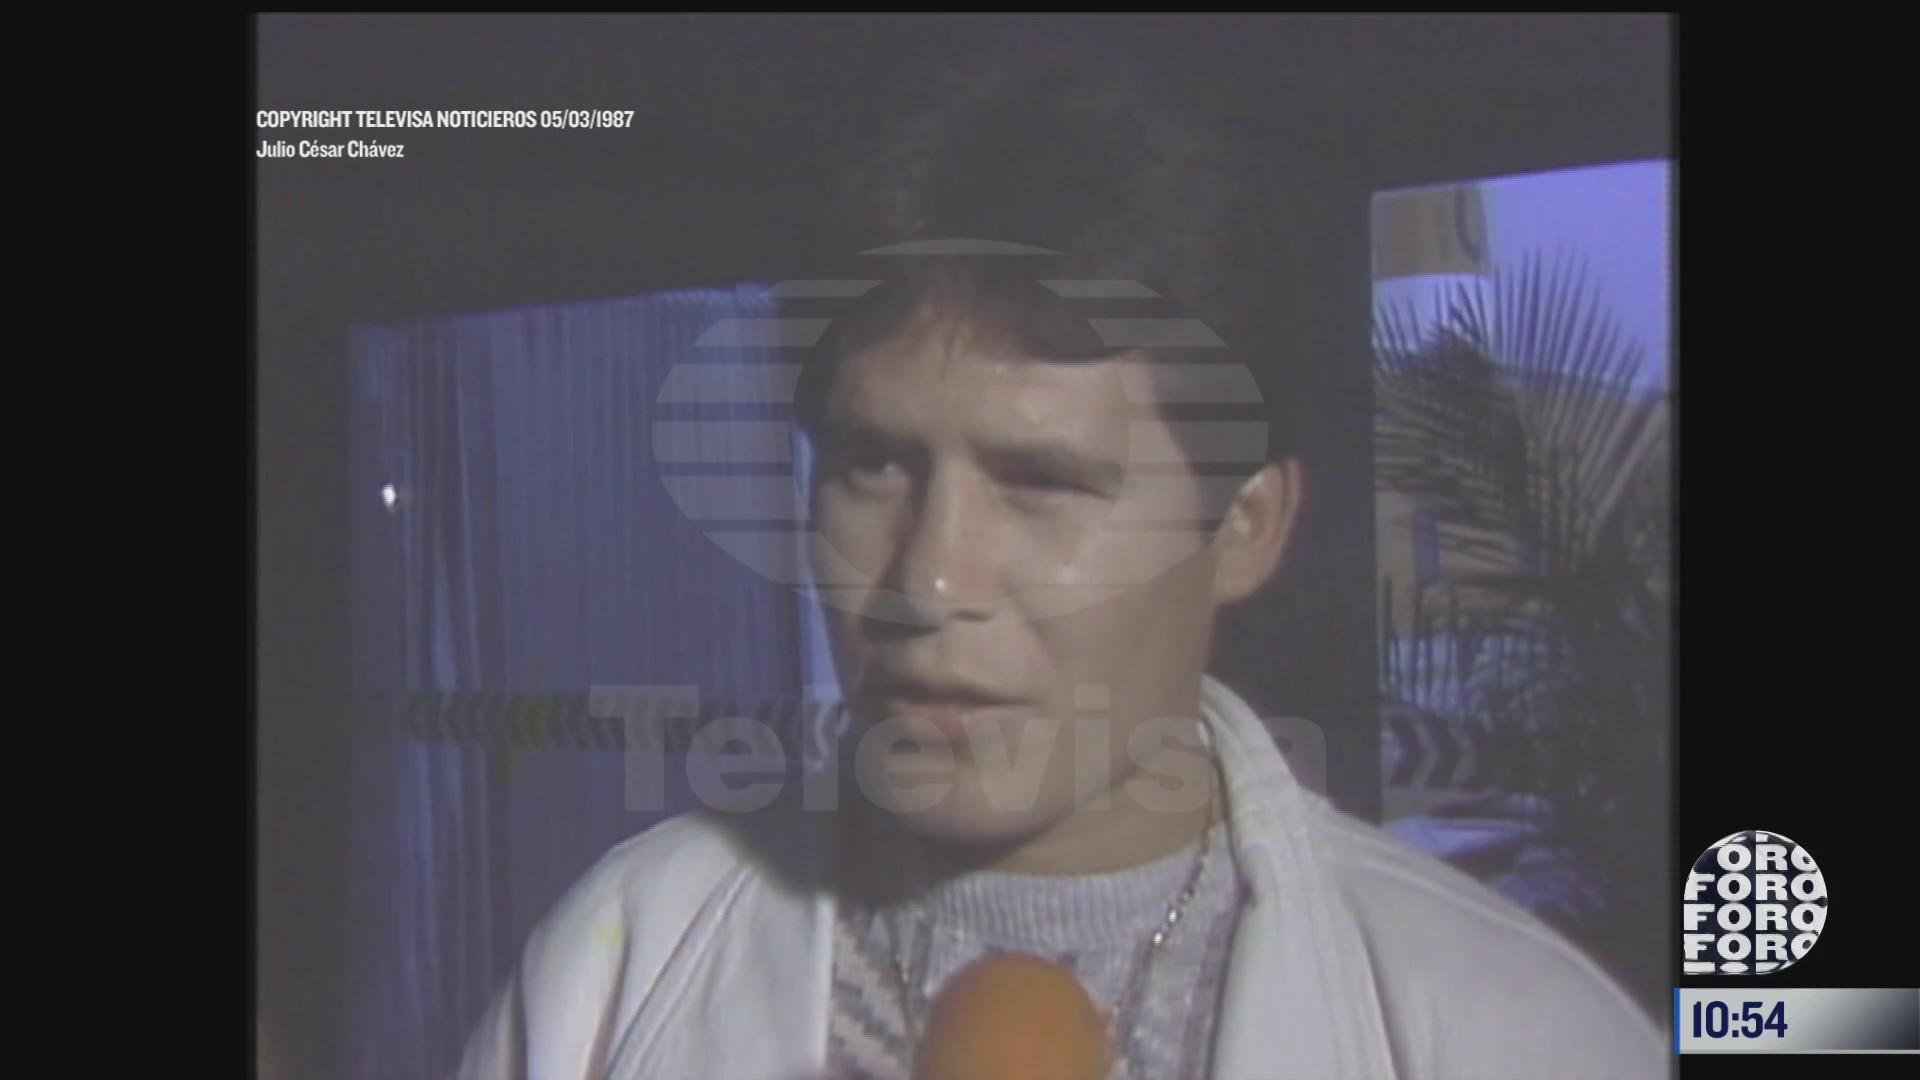 joyasdetv entrevista a julio cesar chavez